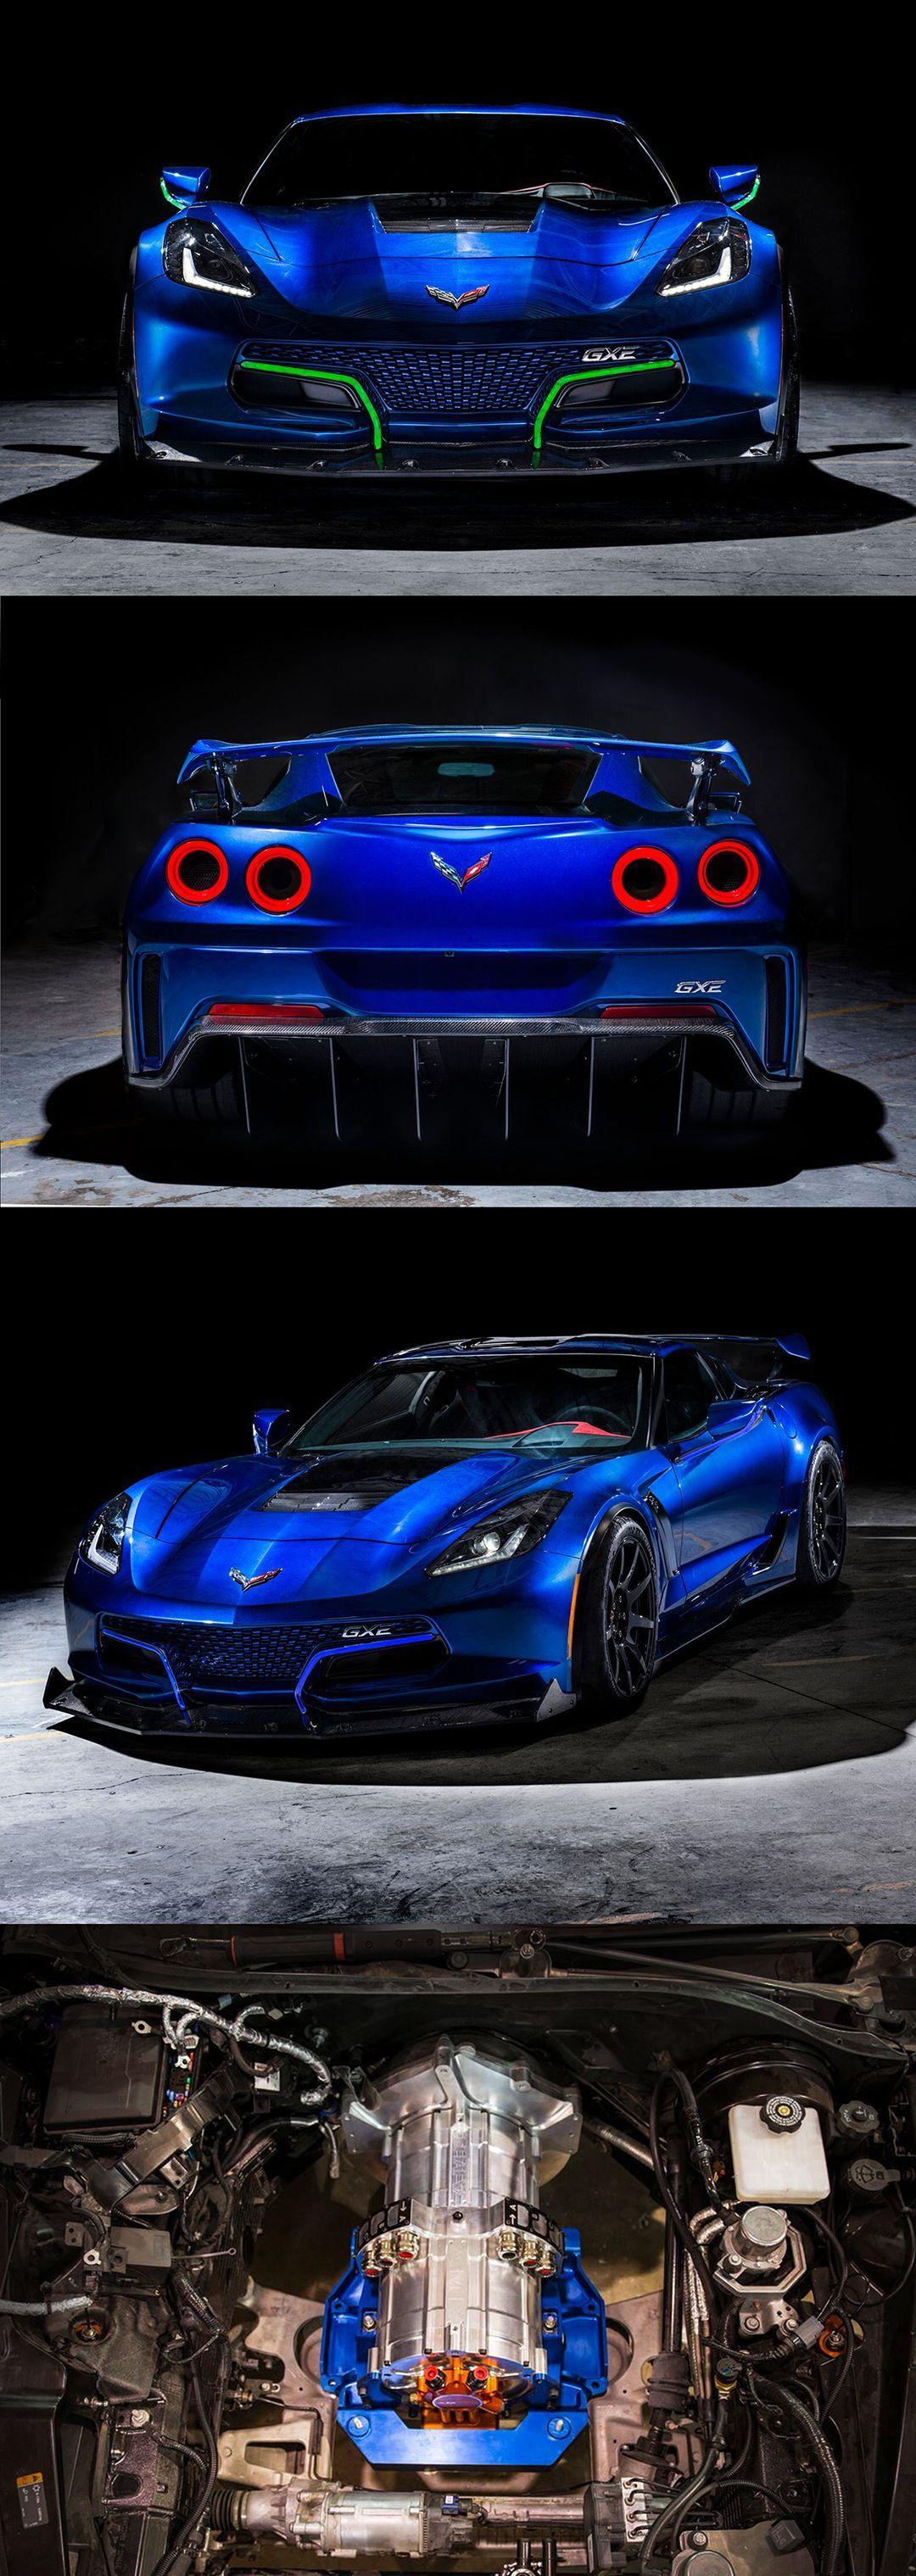 Genovation GXE Supercar All Electric Corvette 0 60 under 3 sec Top